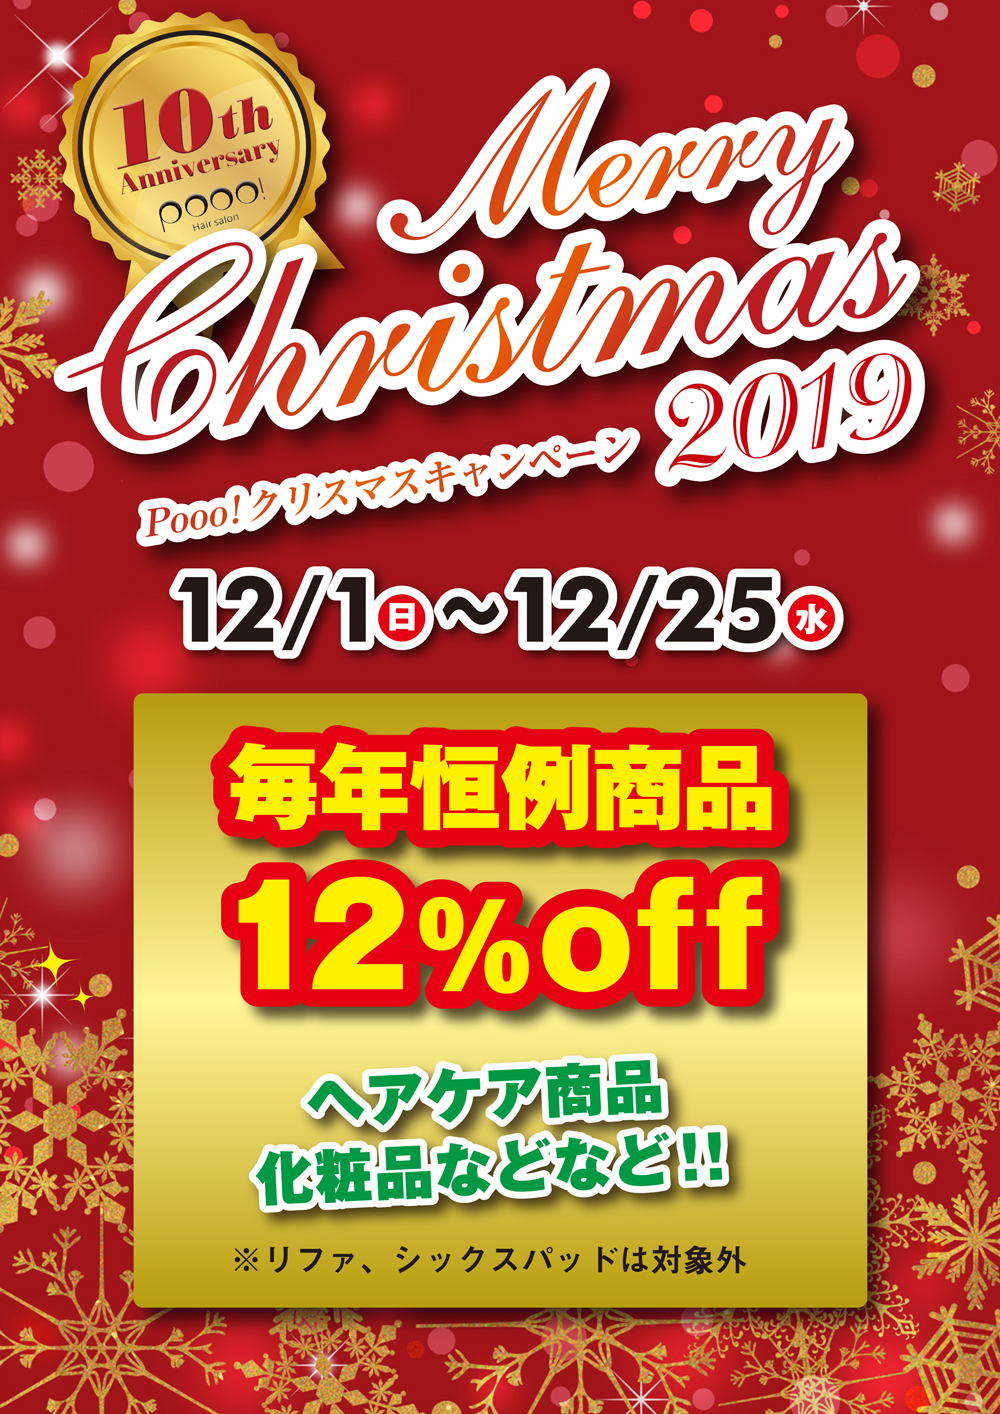 https://pooo.jp/wp-content/uploads/2019/12/1912_Pooo_xmas.jpg